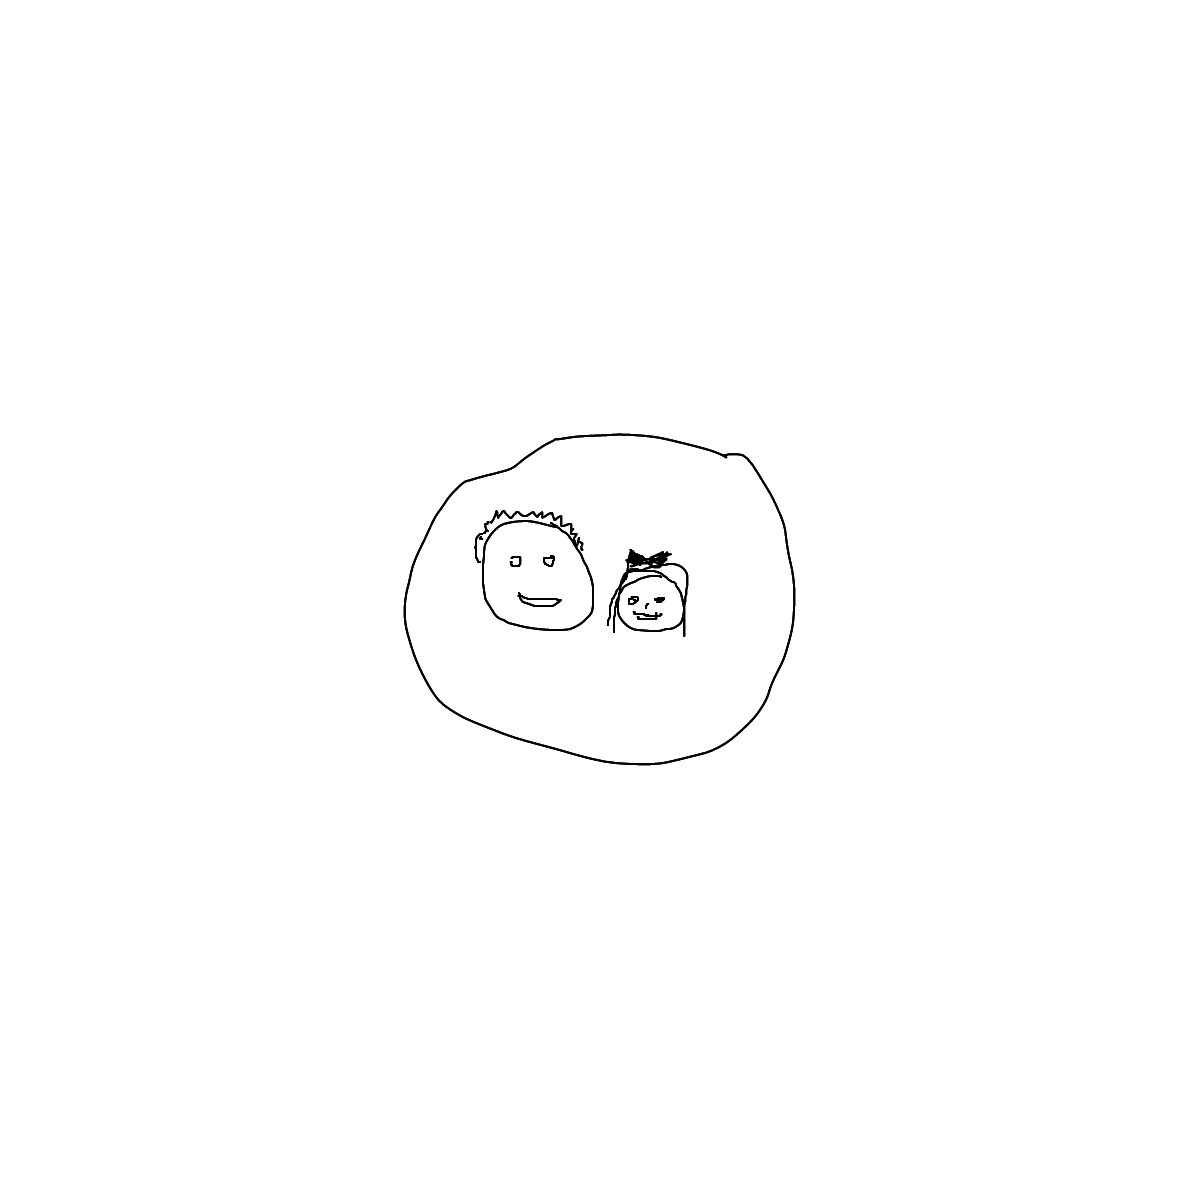 BAAAM drawing#5342 lat:38.4644584655761700lng: 23.5918464660644530